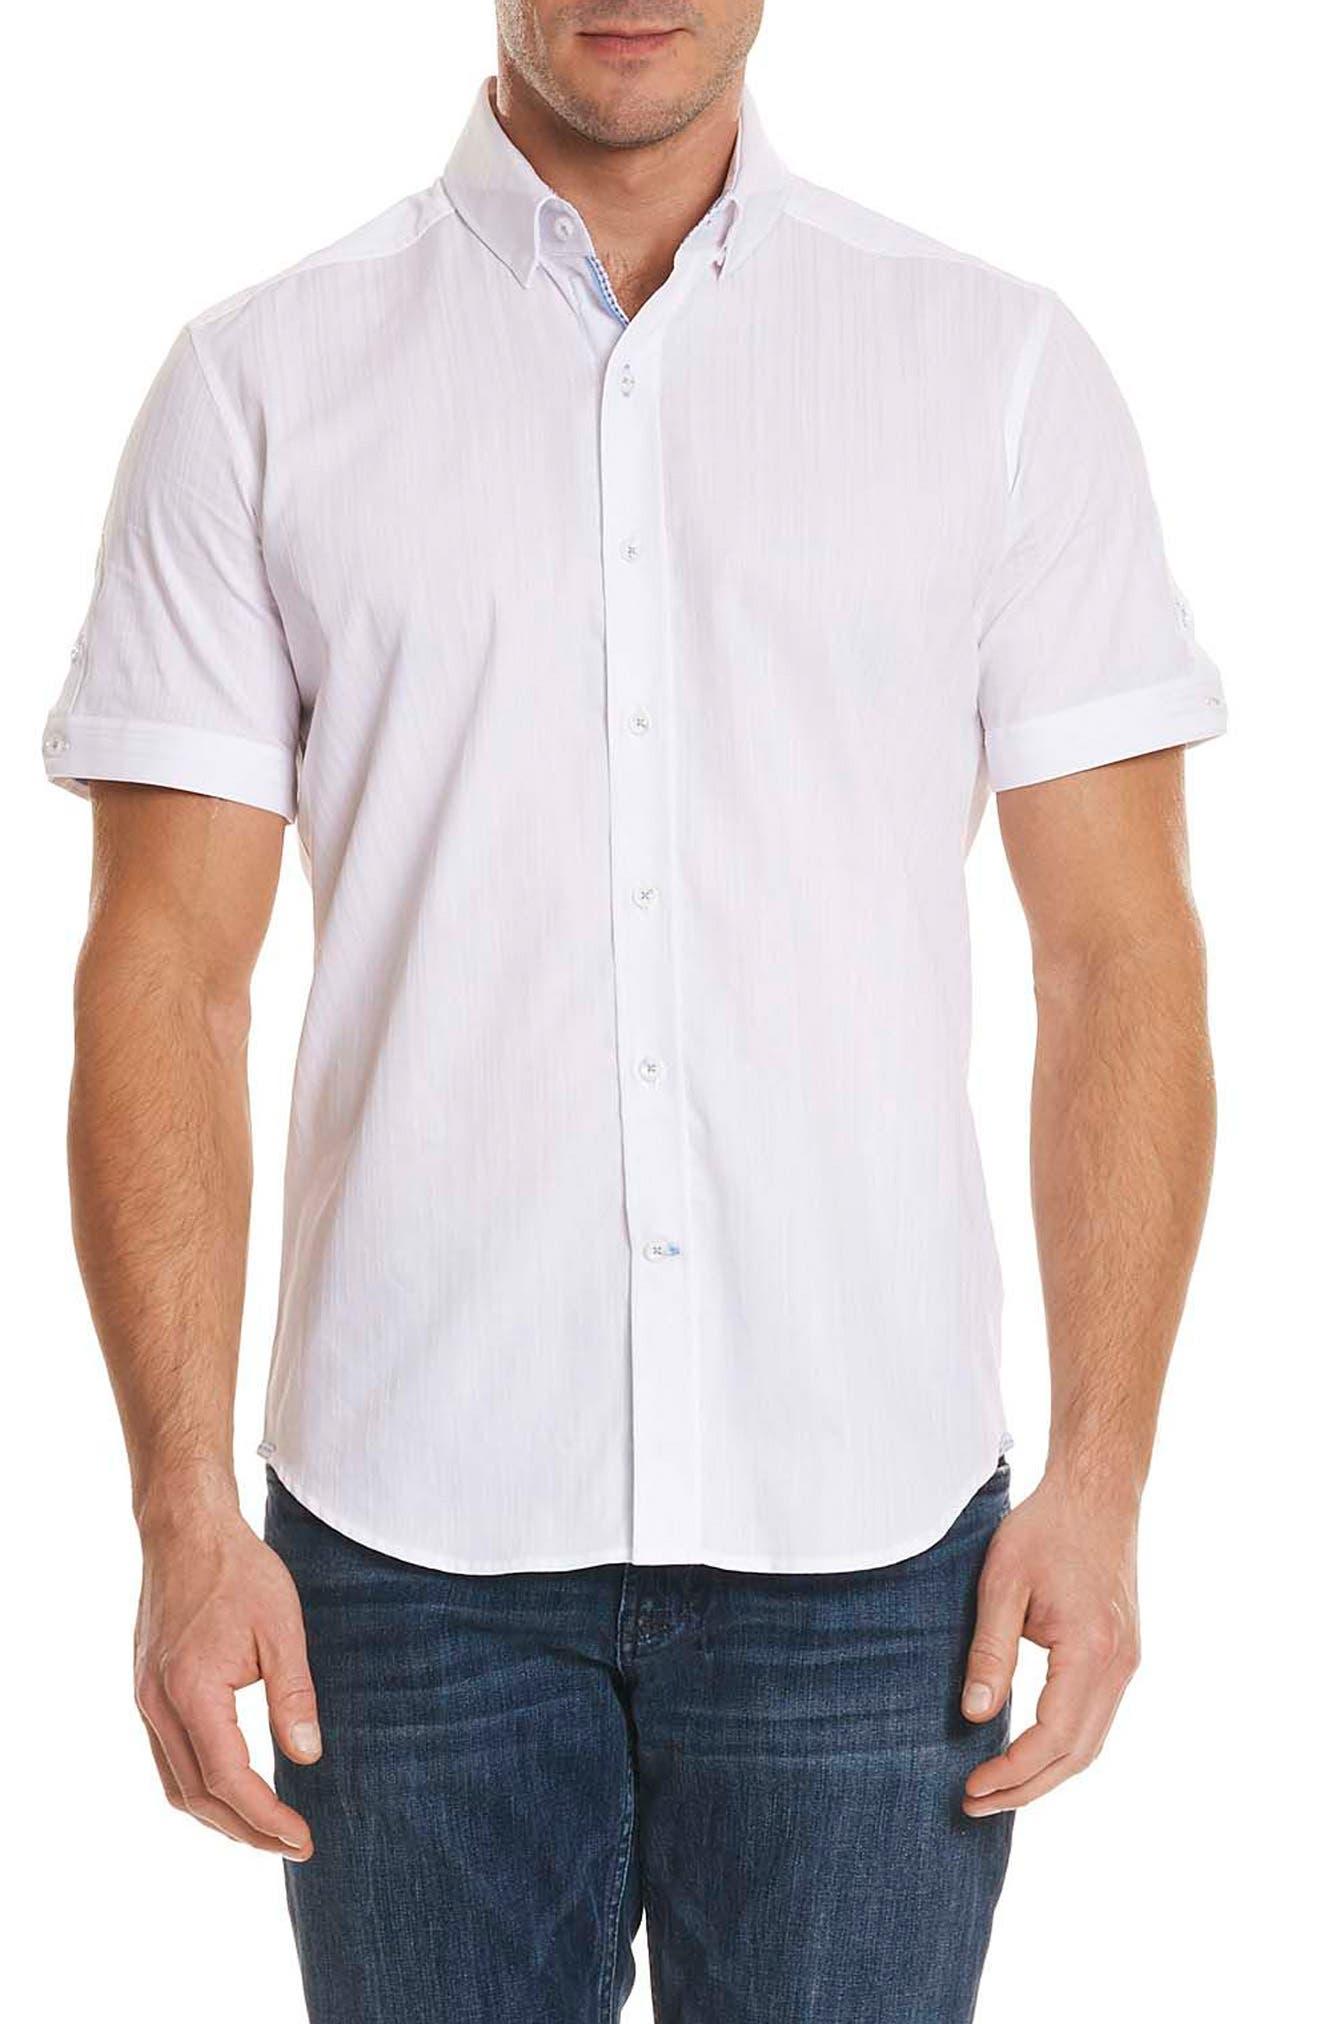 Livingston Regular Fit Short Sleeve Sport Shirt,                             Main thumbnail 1, color,                             100